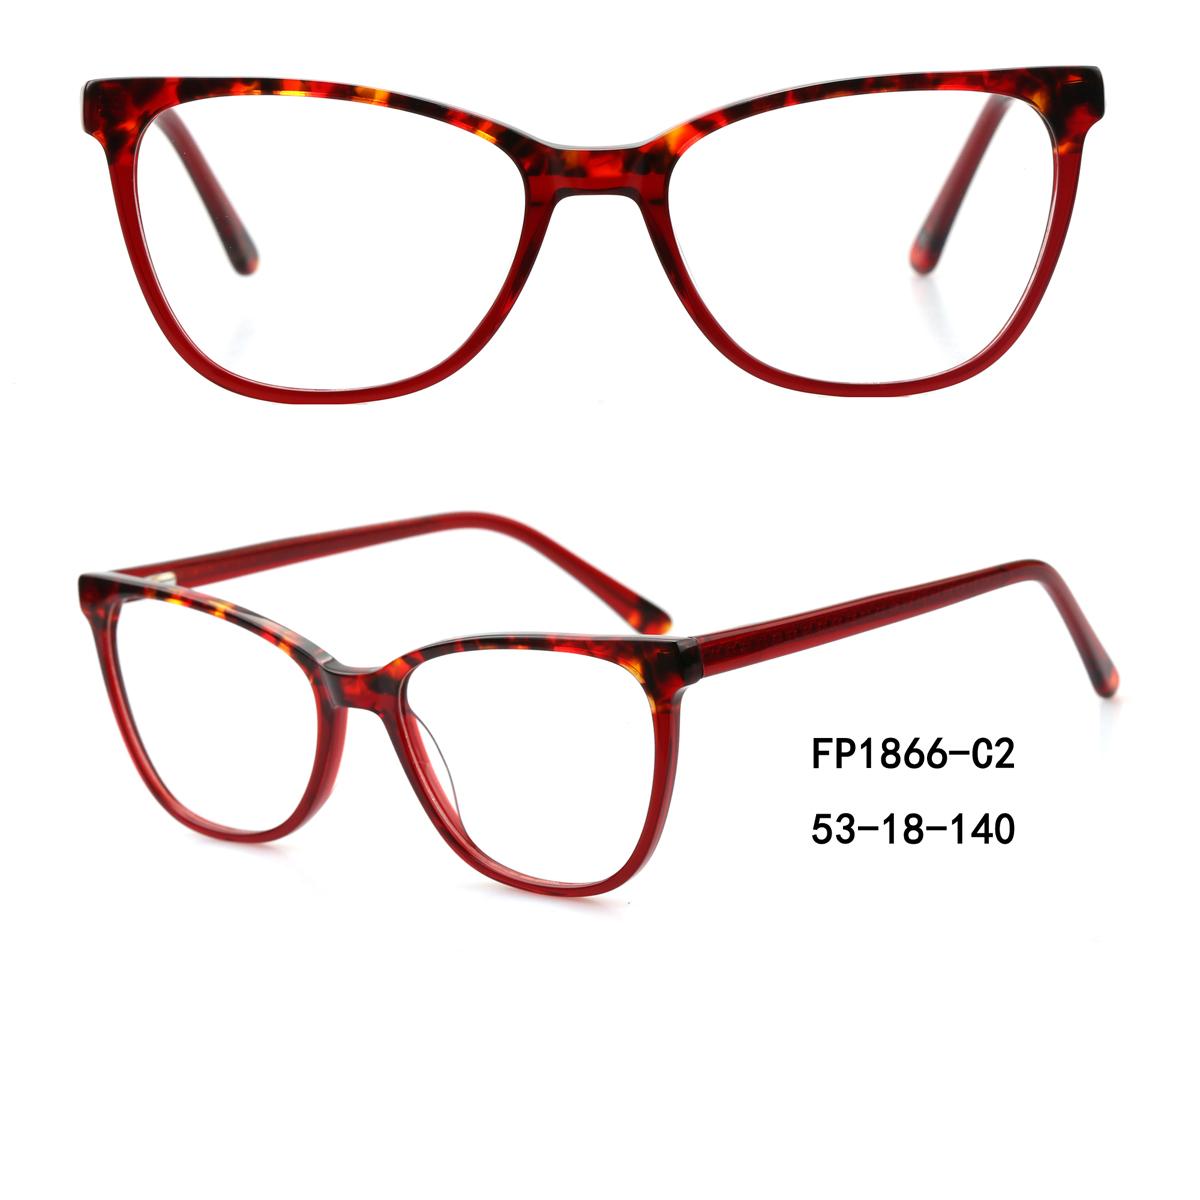 Popeyewear Custom Acetate Spectacle Sunglasses Frames For Sale